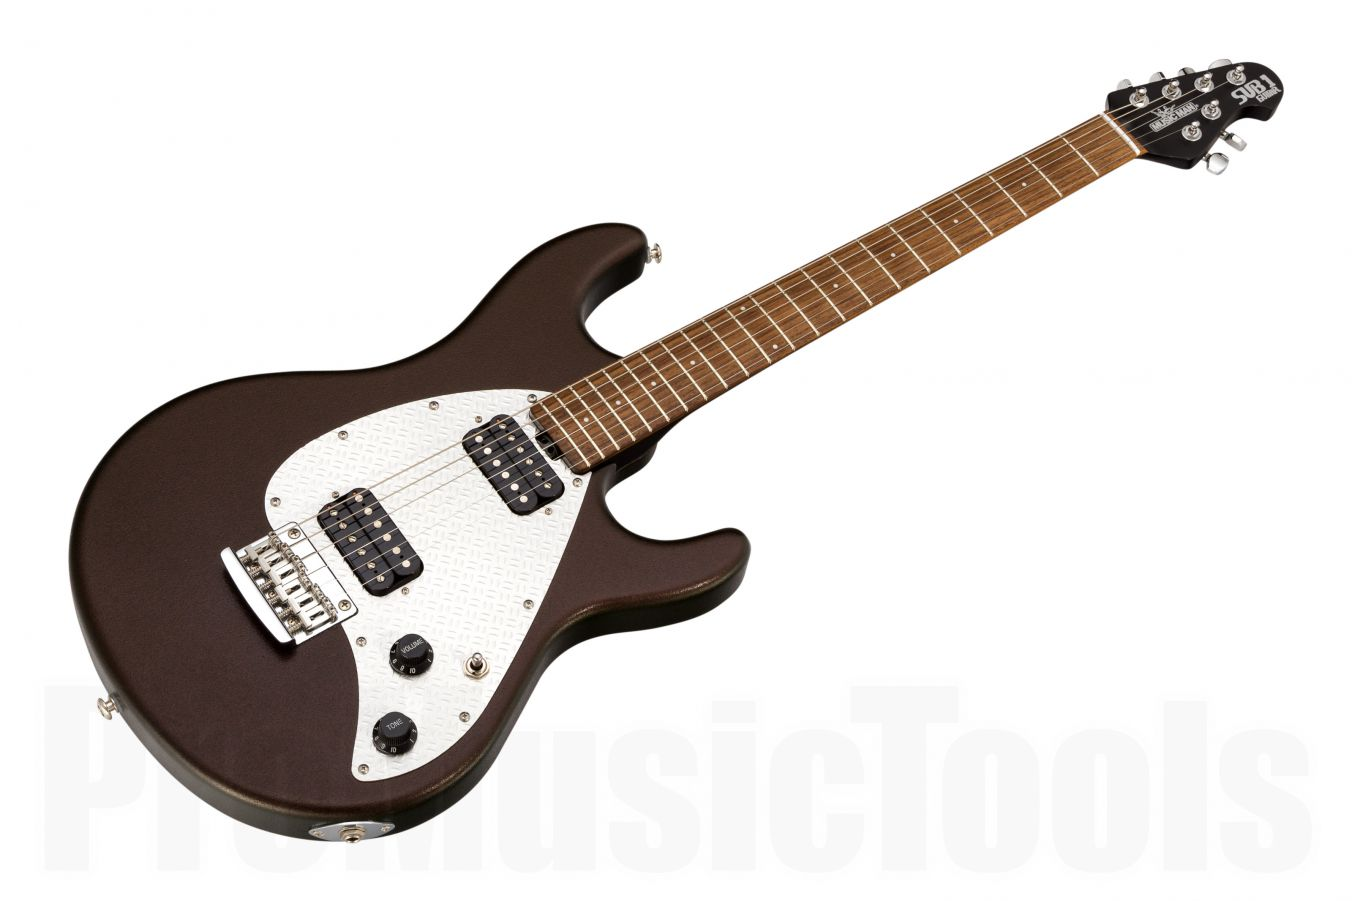 Music Man USA Silhouette S.U.B. 1 STD Guitar HH T7 - Textured Cinnamon